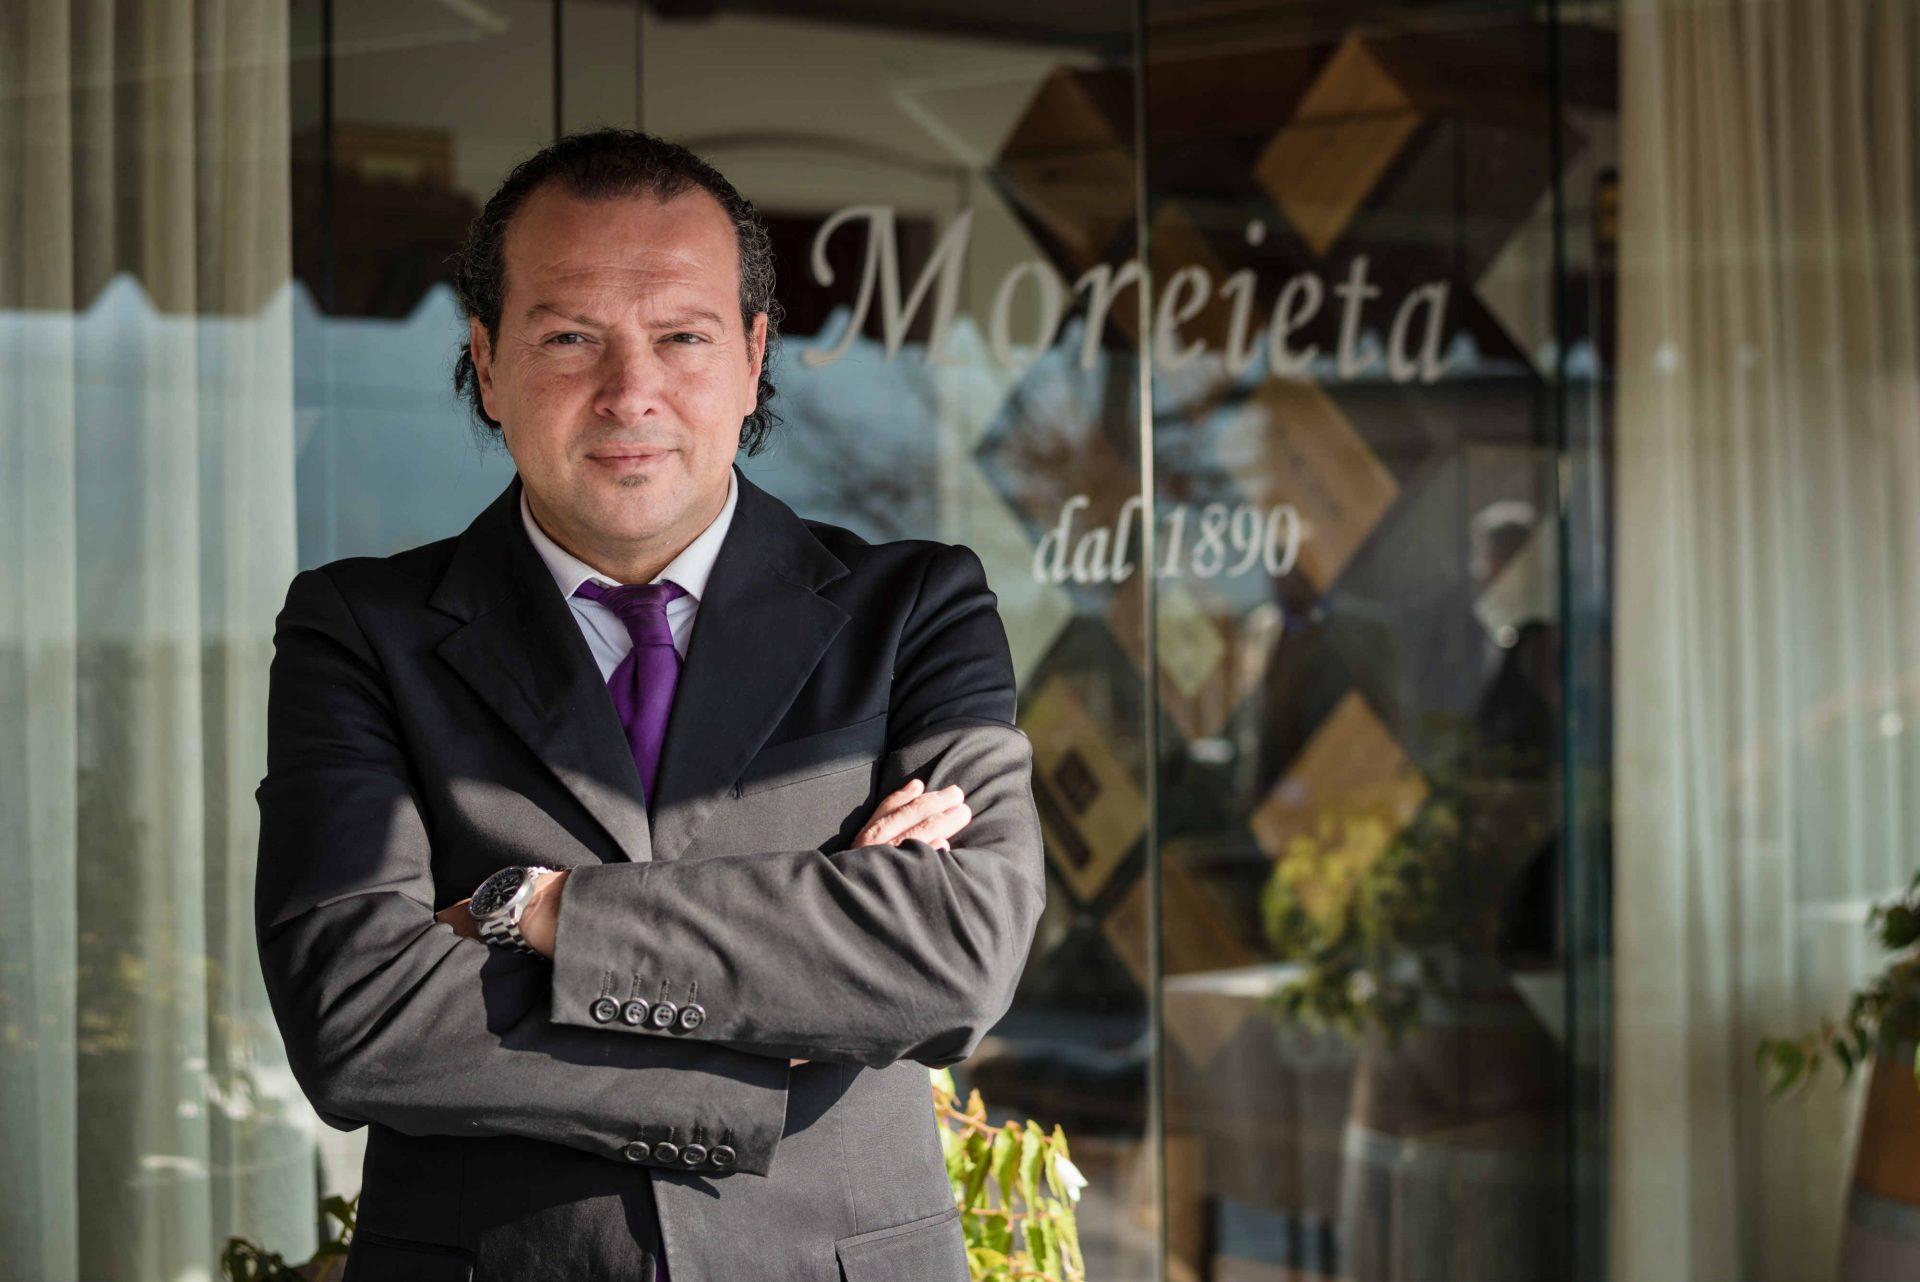 Stefano Costa Antica trattoria Moreieta